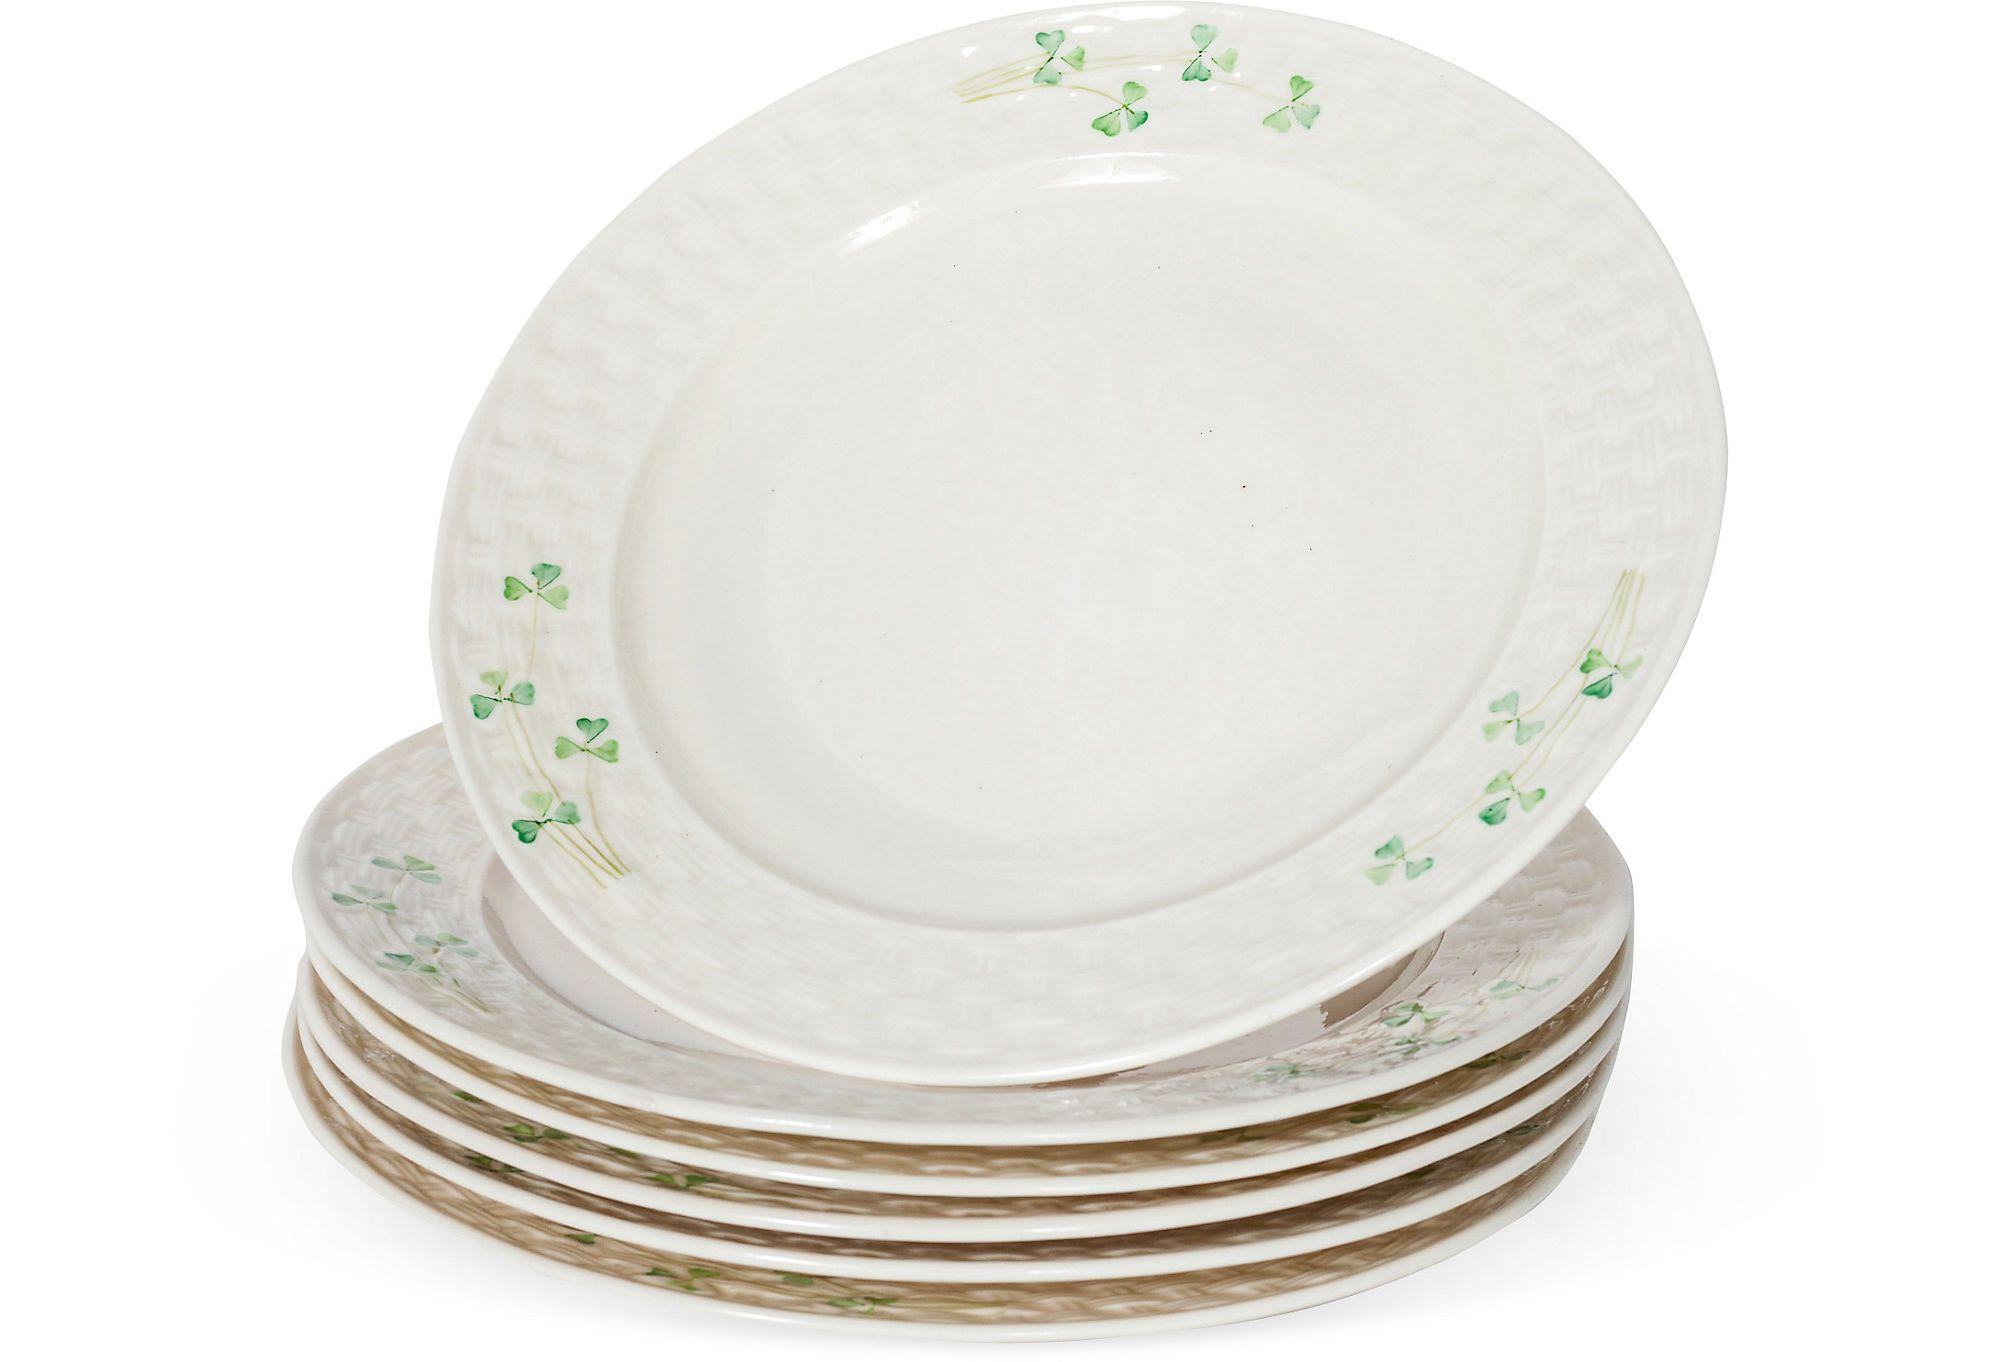 Vintage Irish Belleek Plates Set of 6 on One Kings Lane today  sc 1 st  Pinterest & Vintage Irish Belleek Plates Set of 6 on One Kings Lane today ...